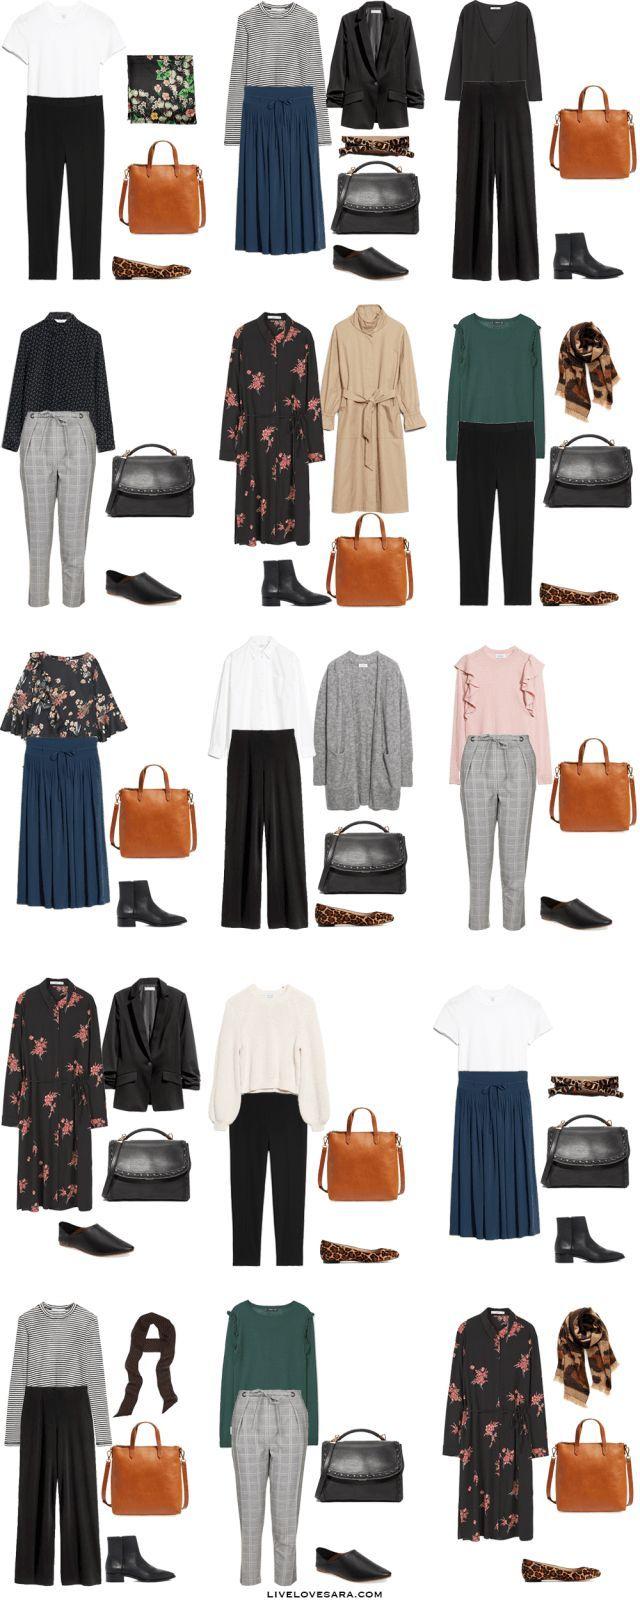 Starter Work Capsule Outfit Options 1-15 via livelovesara